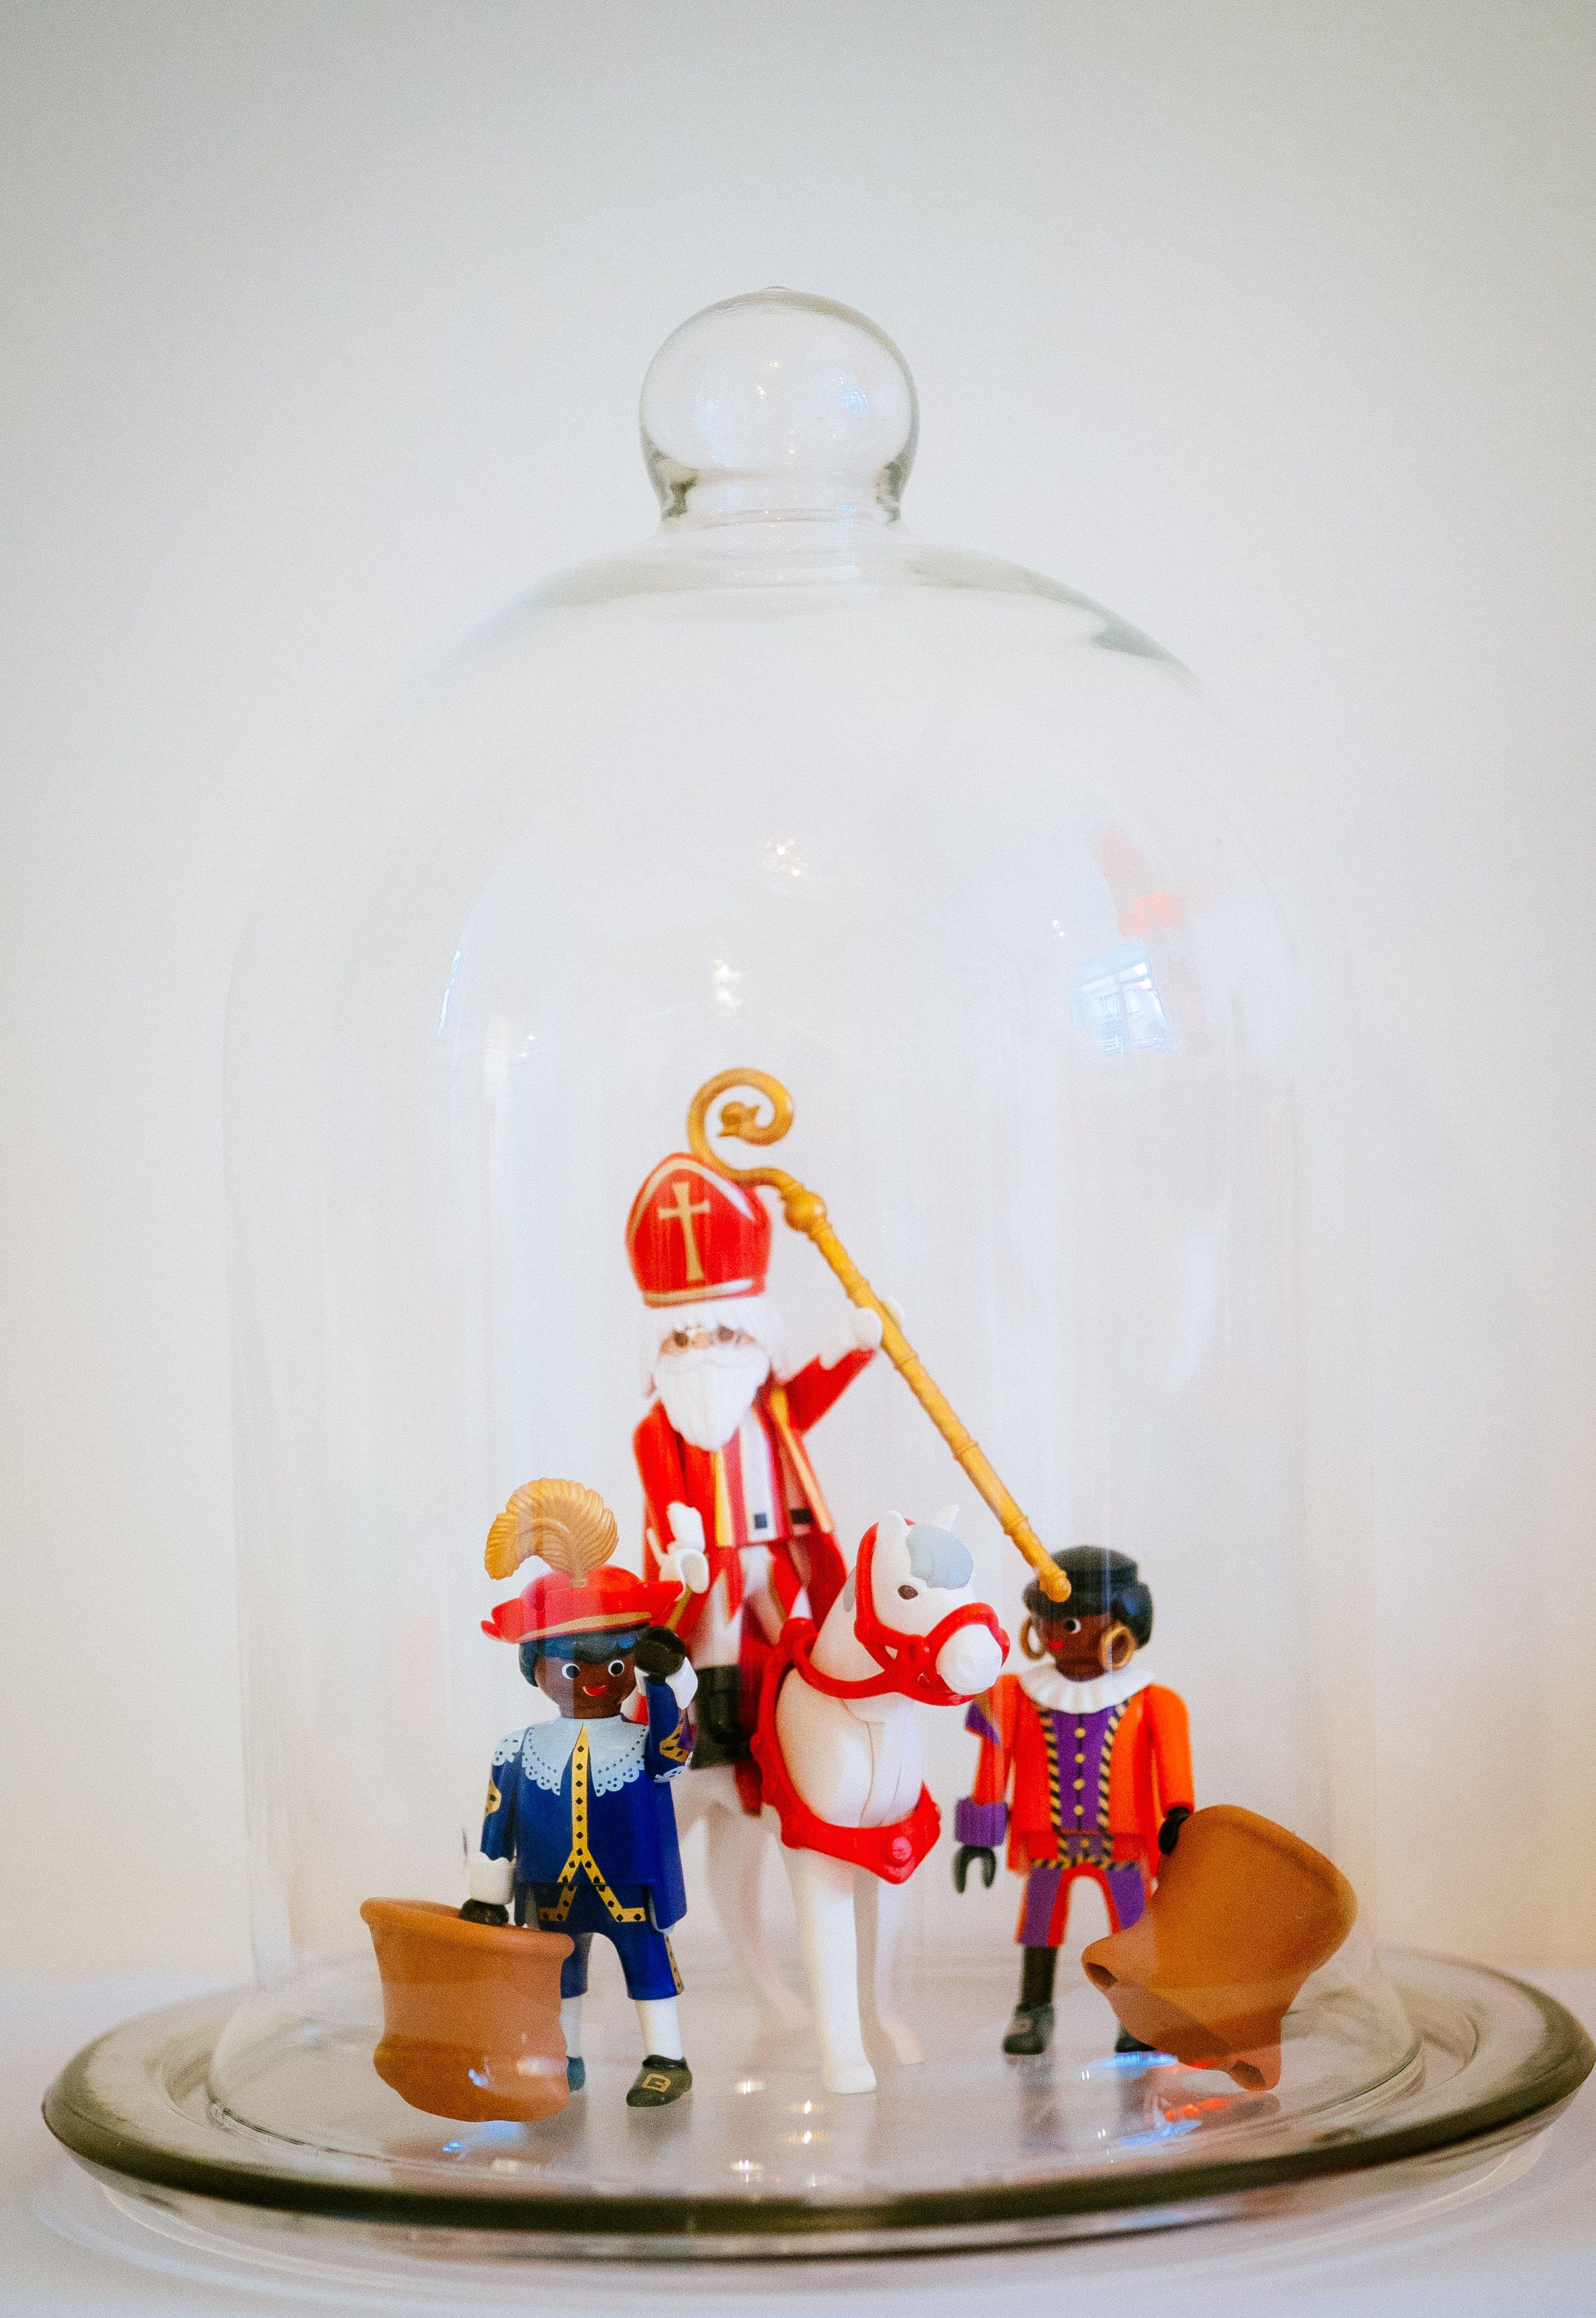 Sinterklaas en zwarte pieten in glazen stolp- decoratie- 5 december- sint-piet-cloche- Sinterklaas- http://www.galerie-lucie.nl/